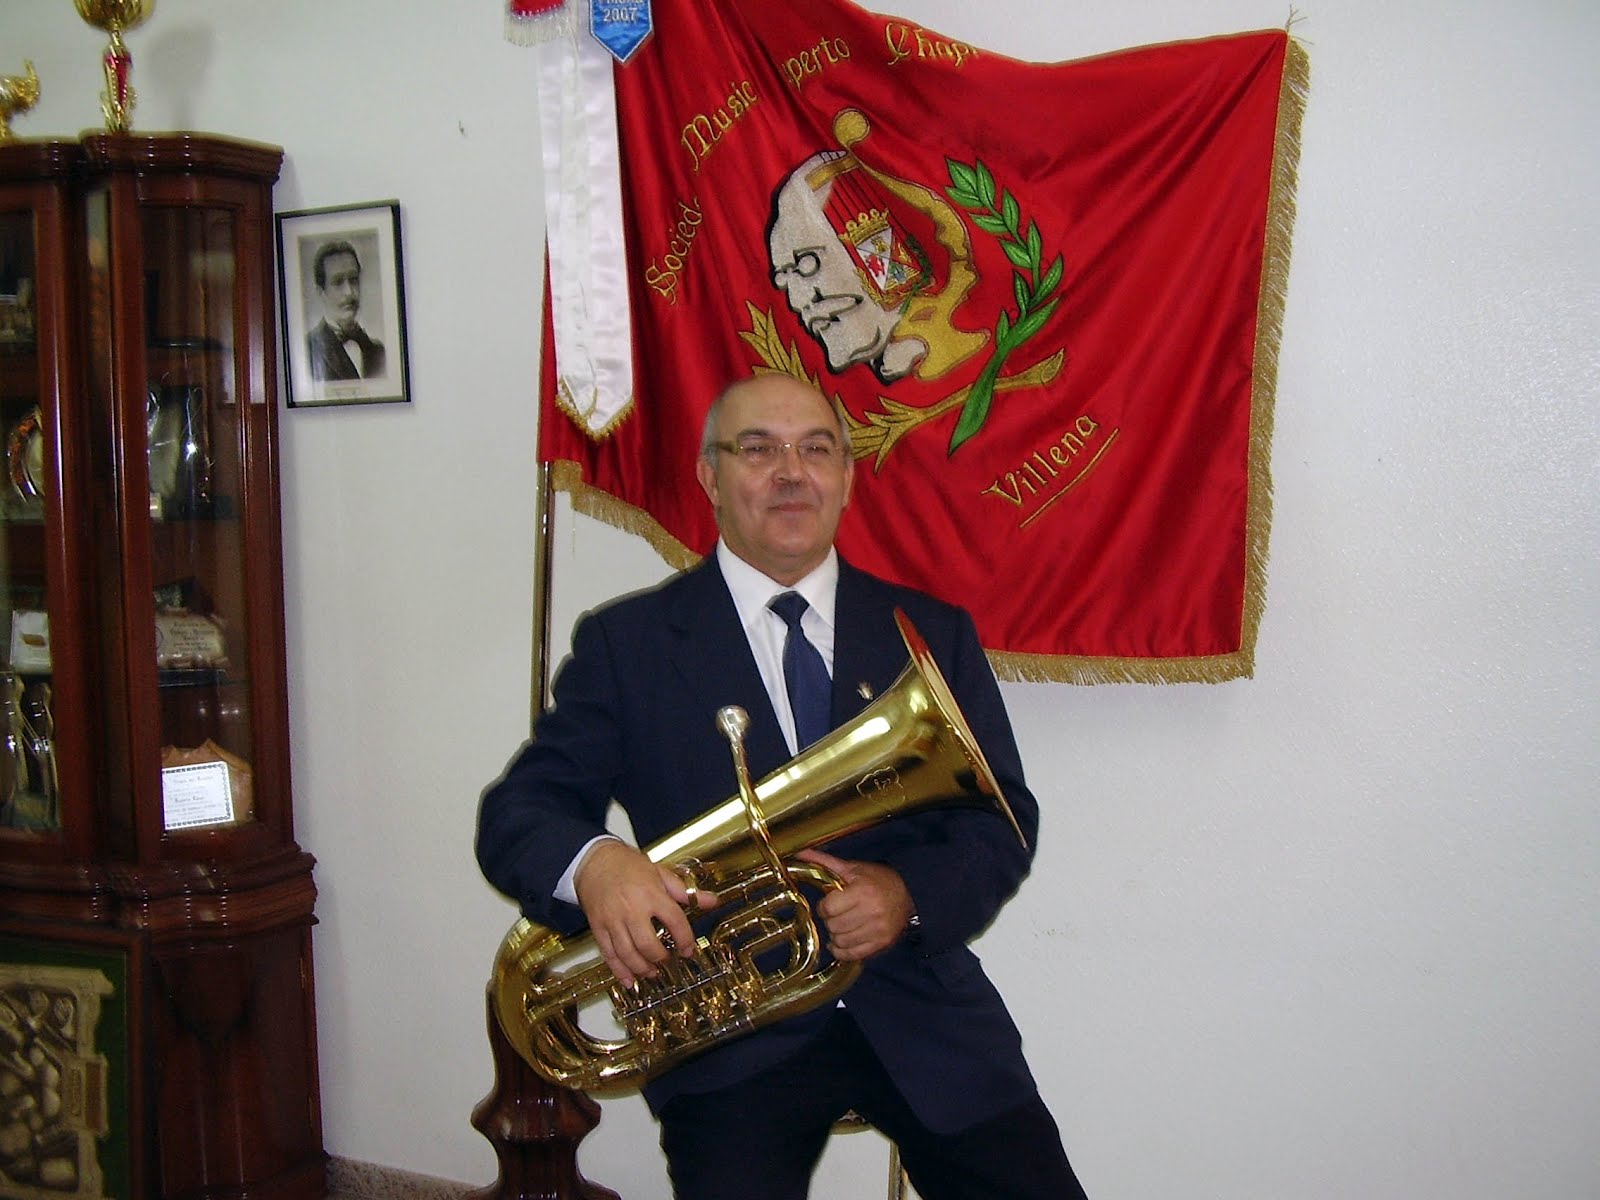 Ruperto Chapí - La Revoltosa